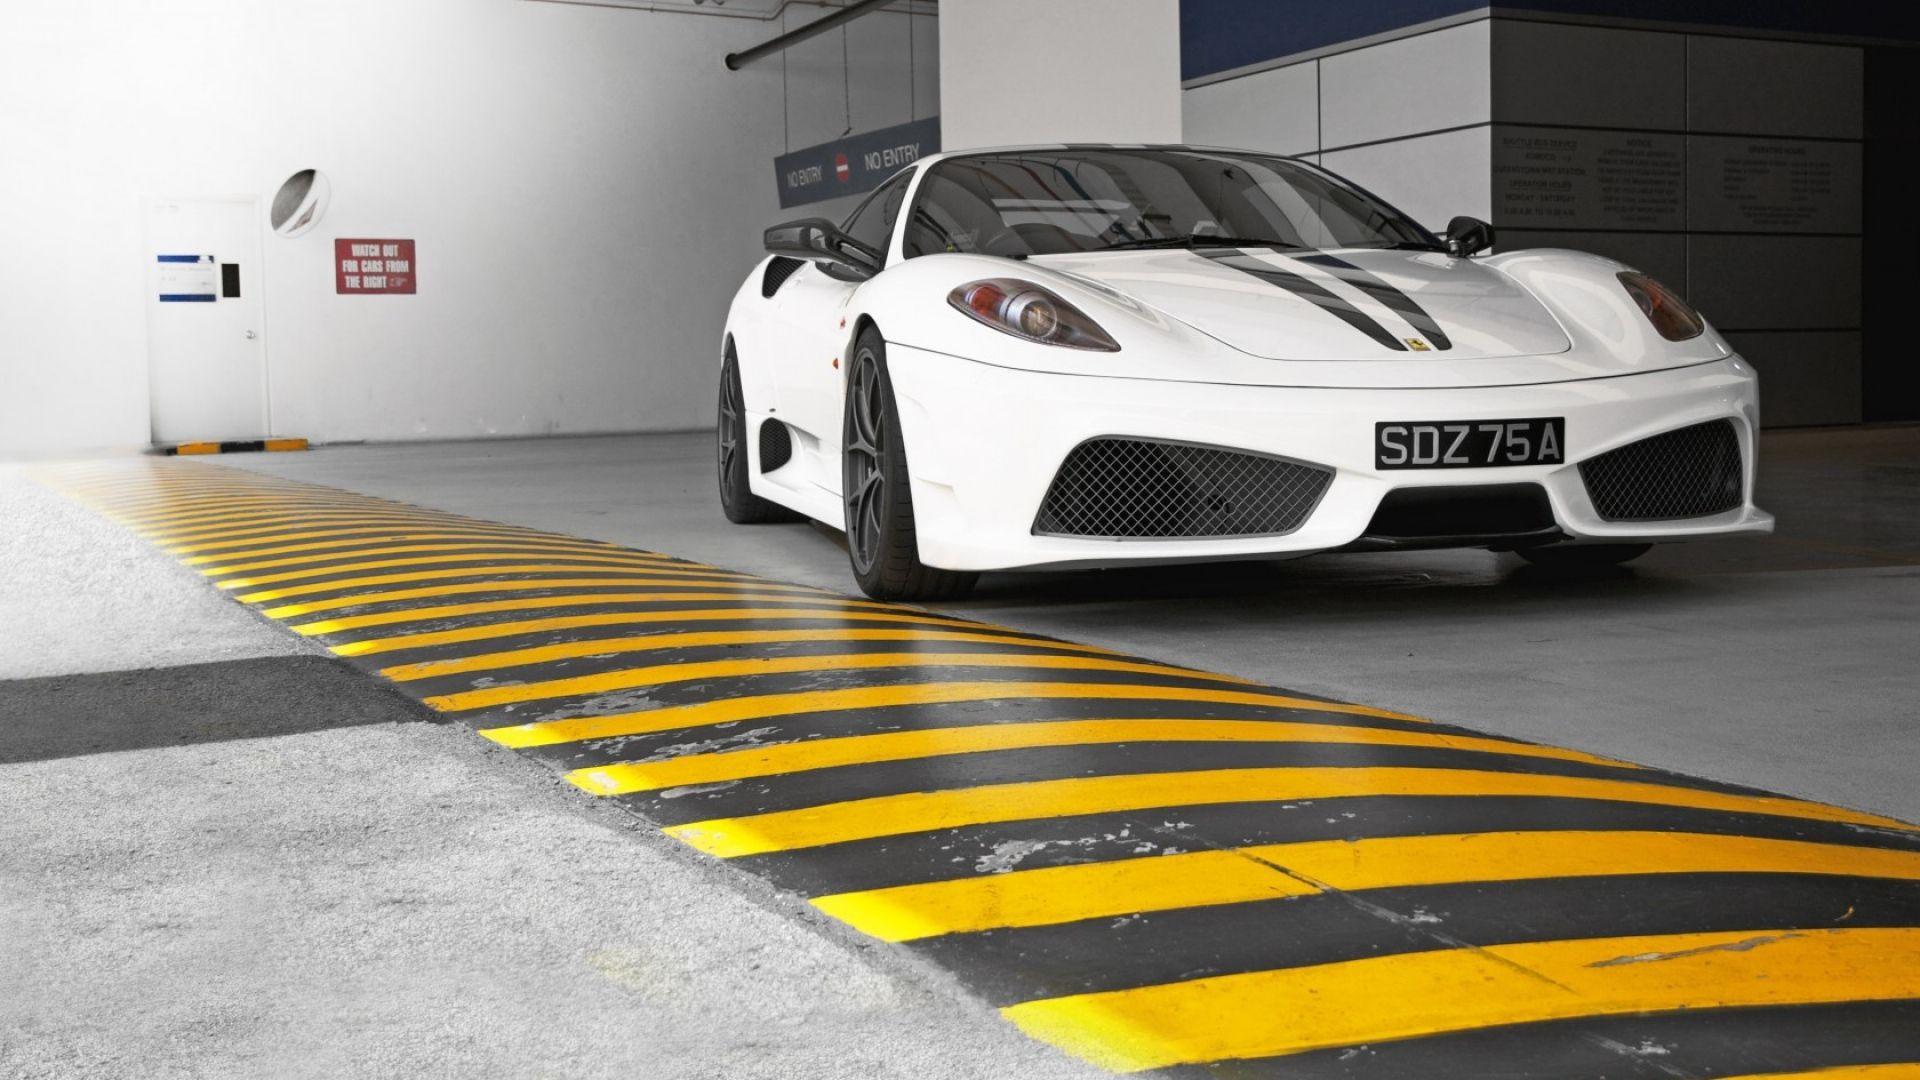 Download Wallpaper 1920x1080 Ferrari White Front View Full Hd 1080p Hd Background